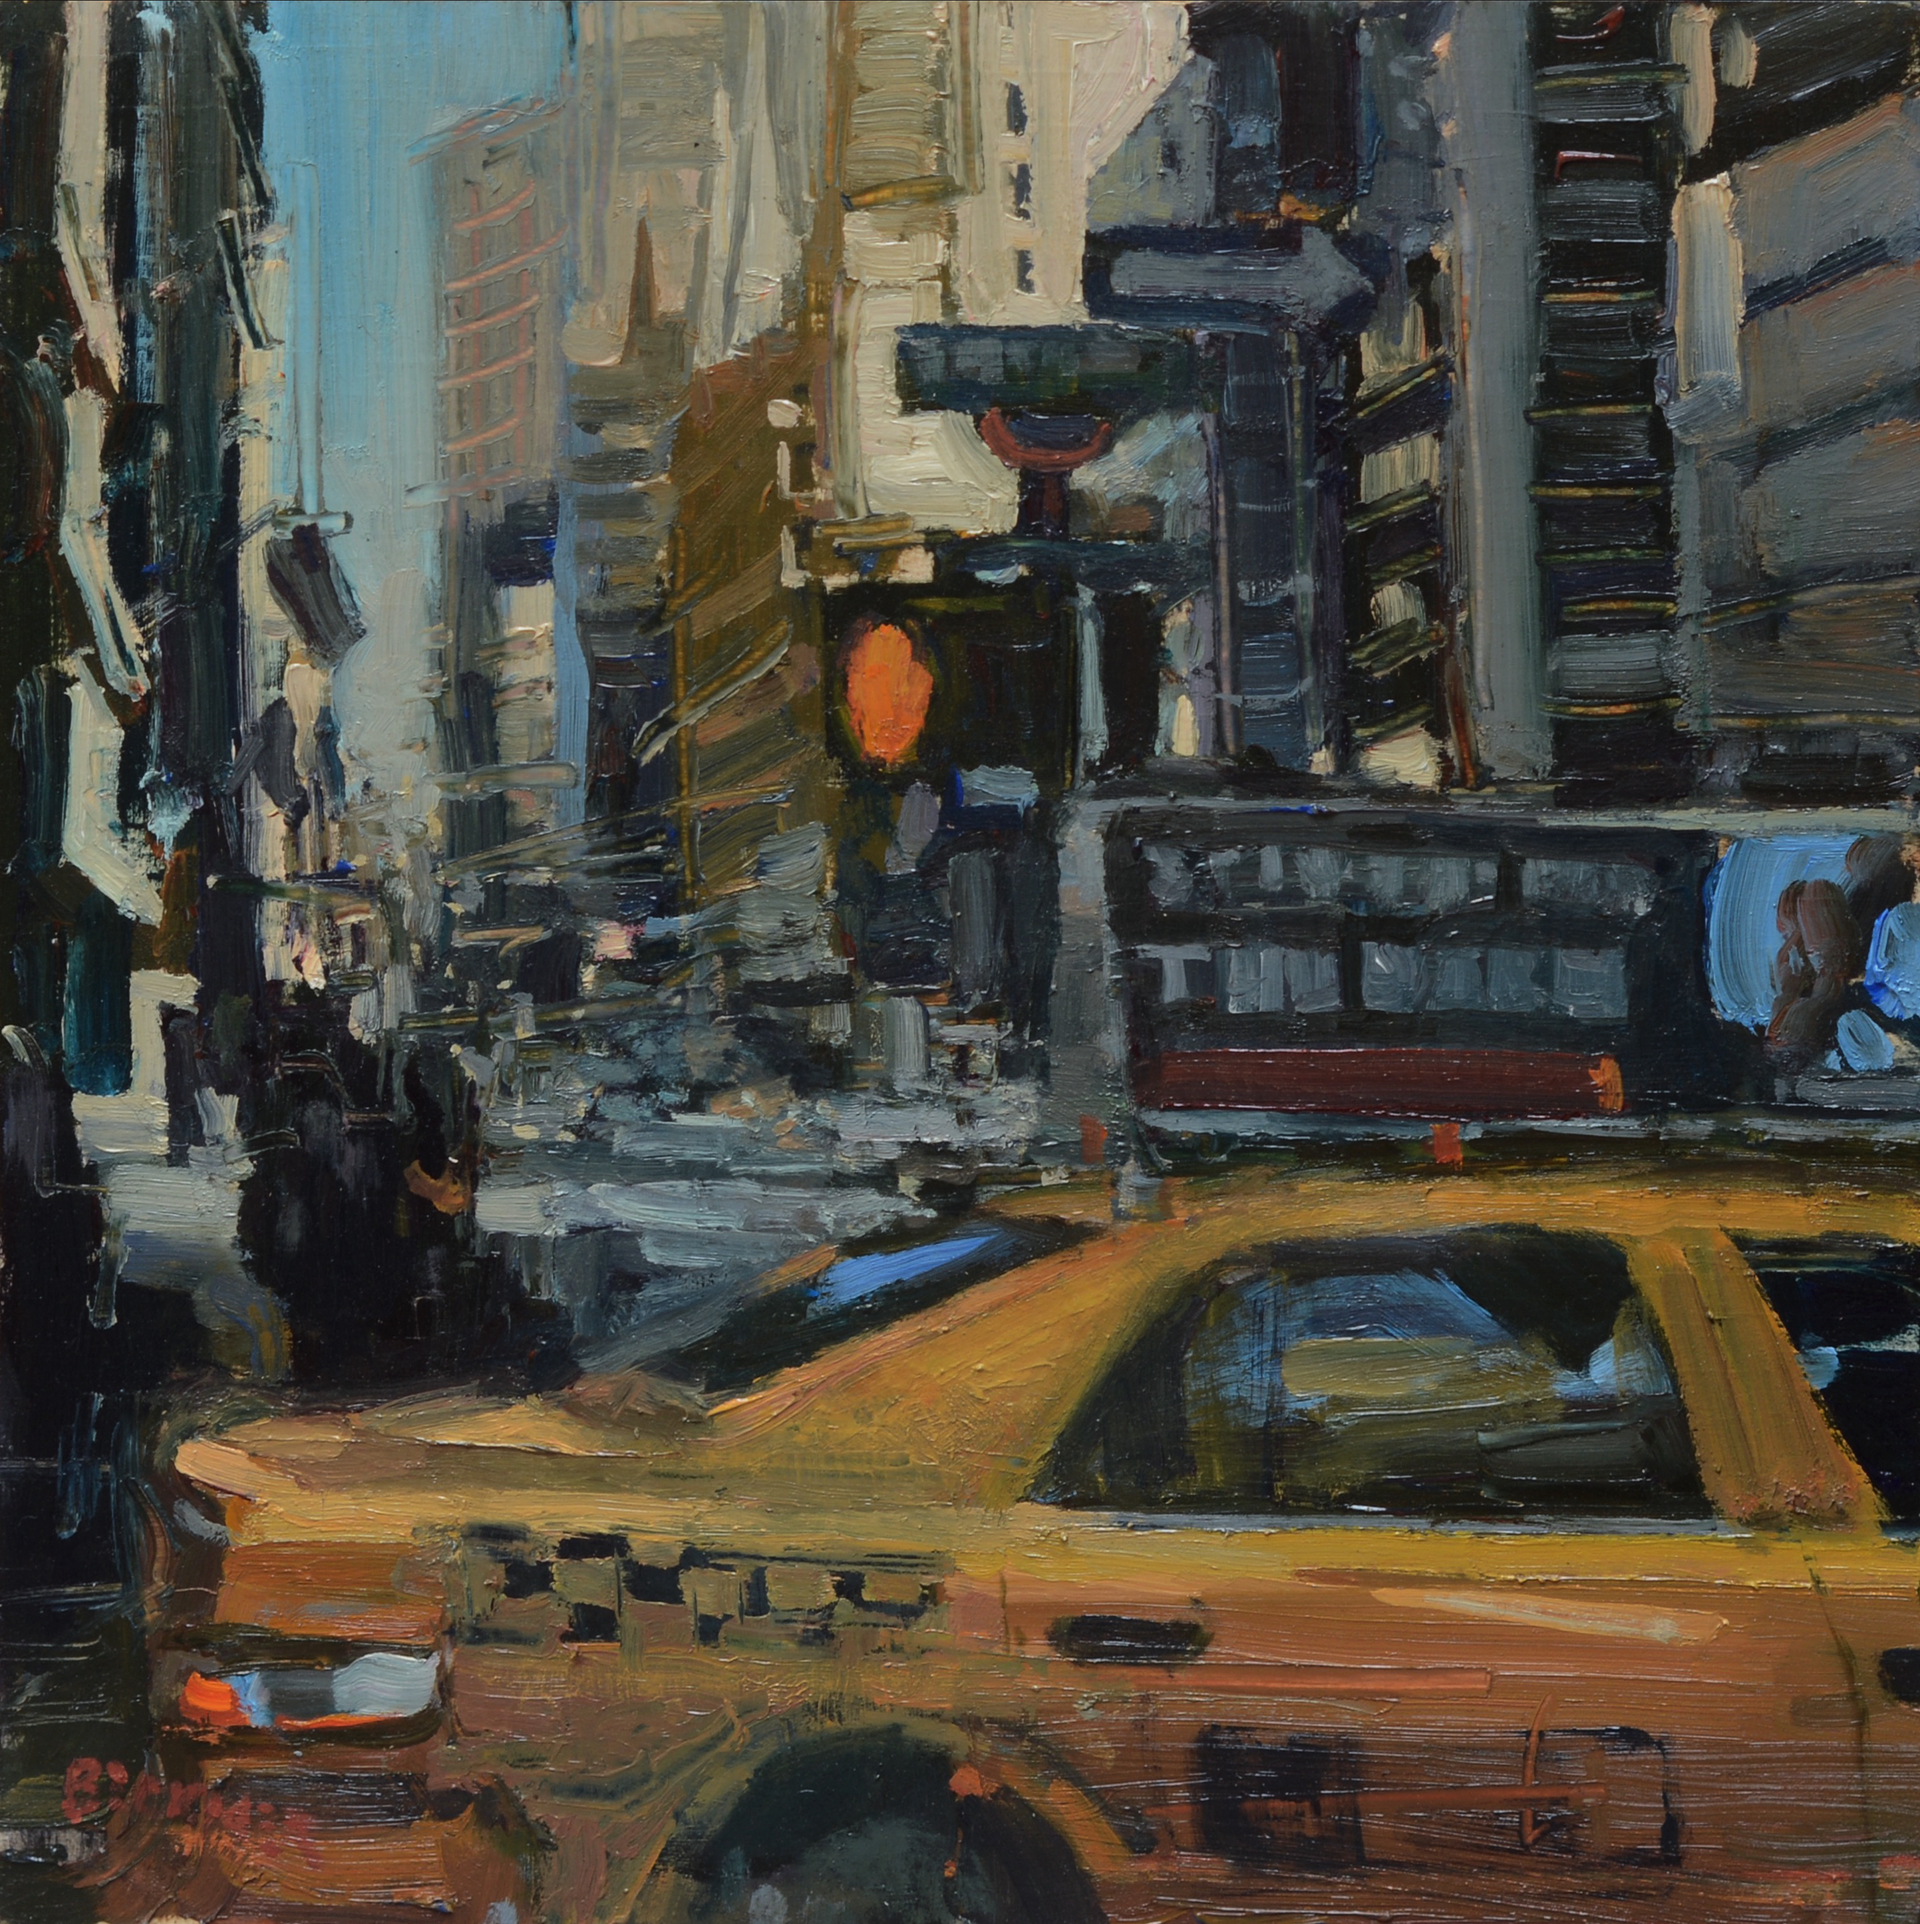 Taxi by Jim Beckner